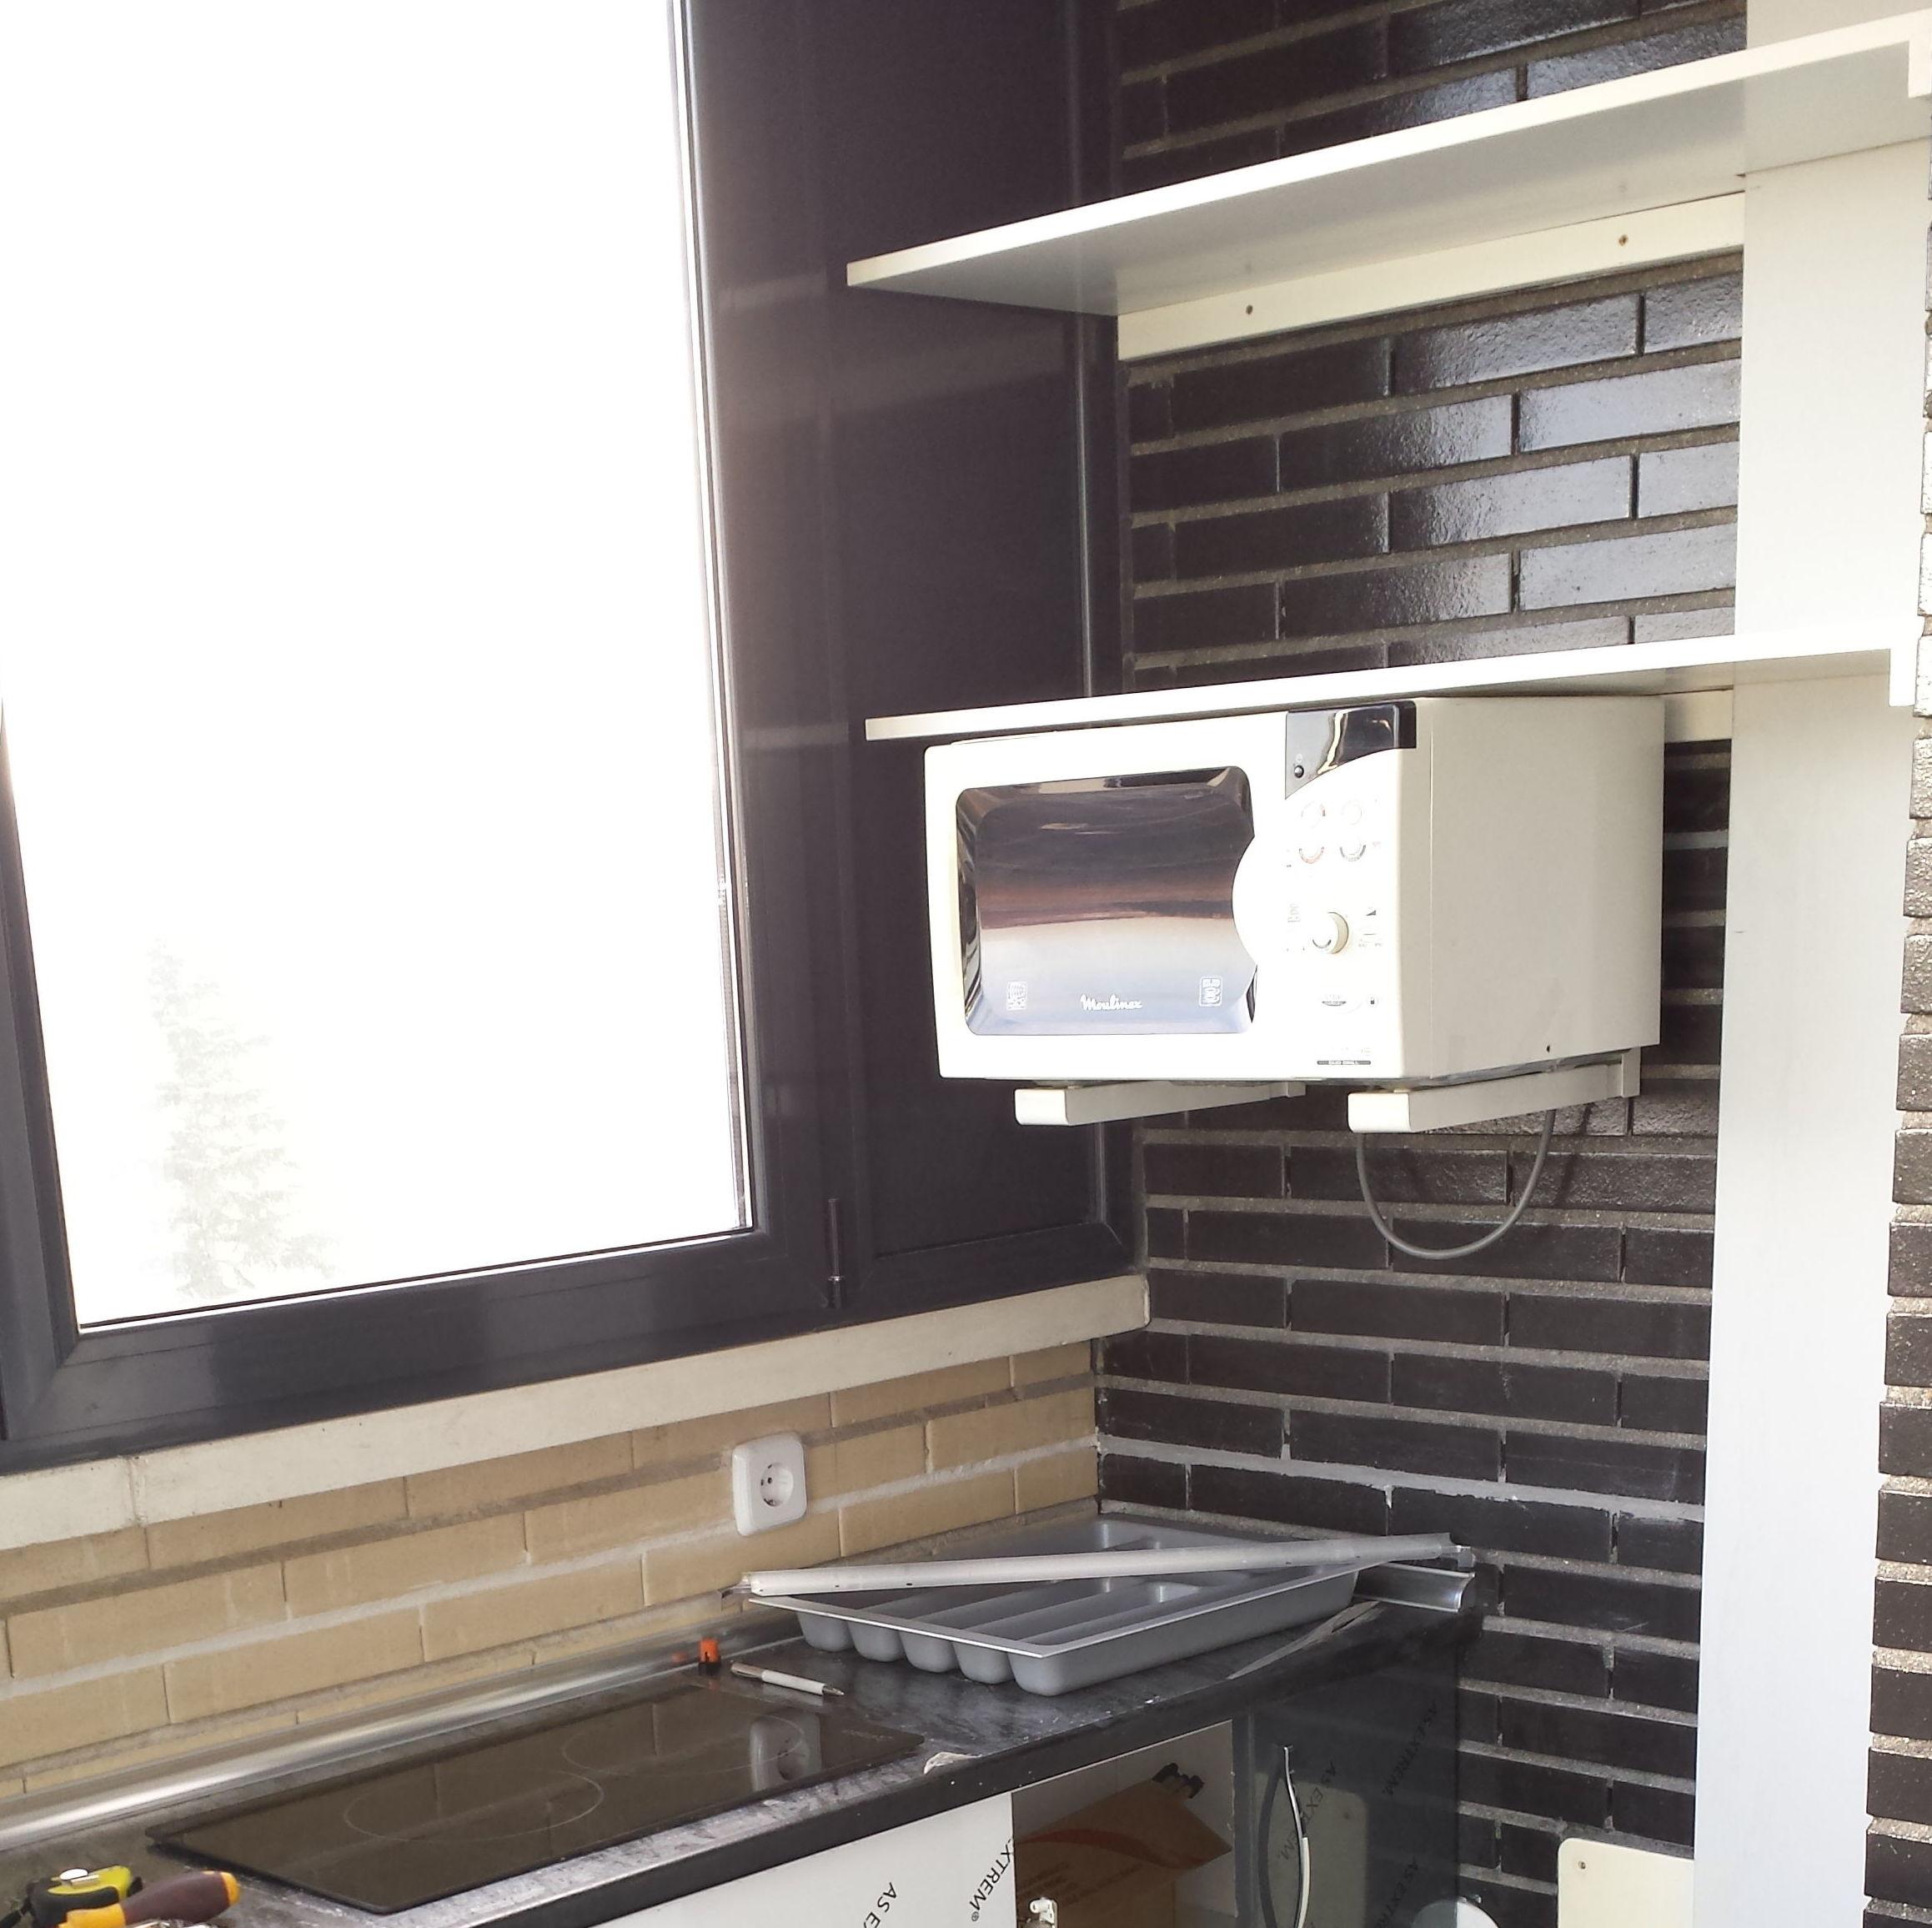 Montajes de muebles de cocina.